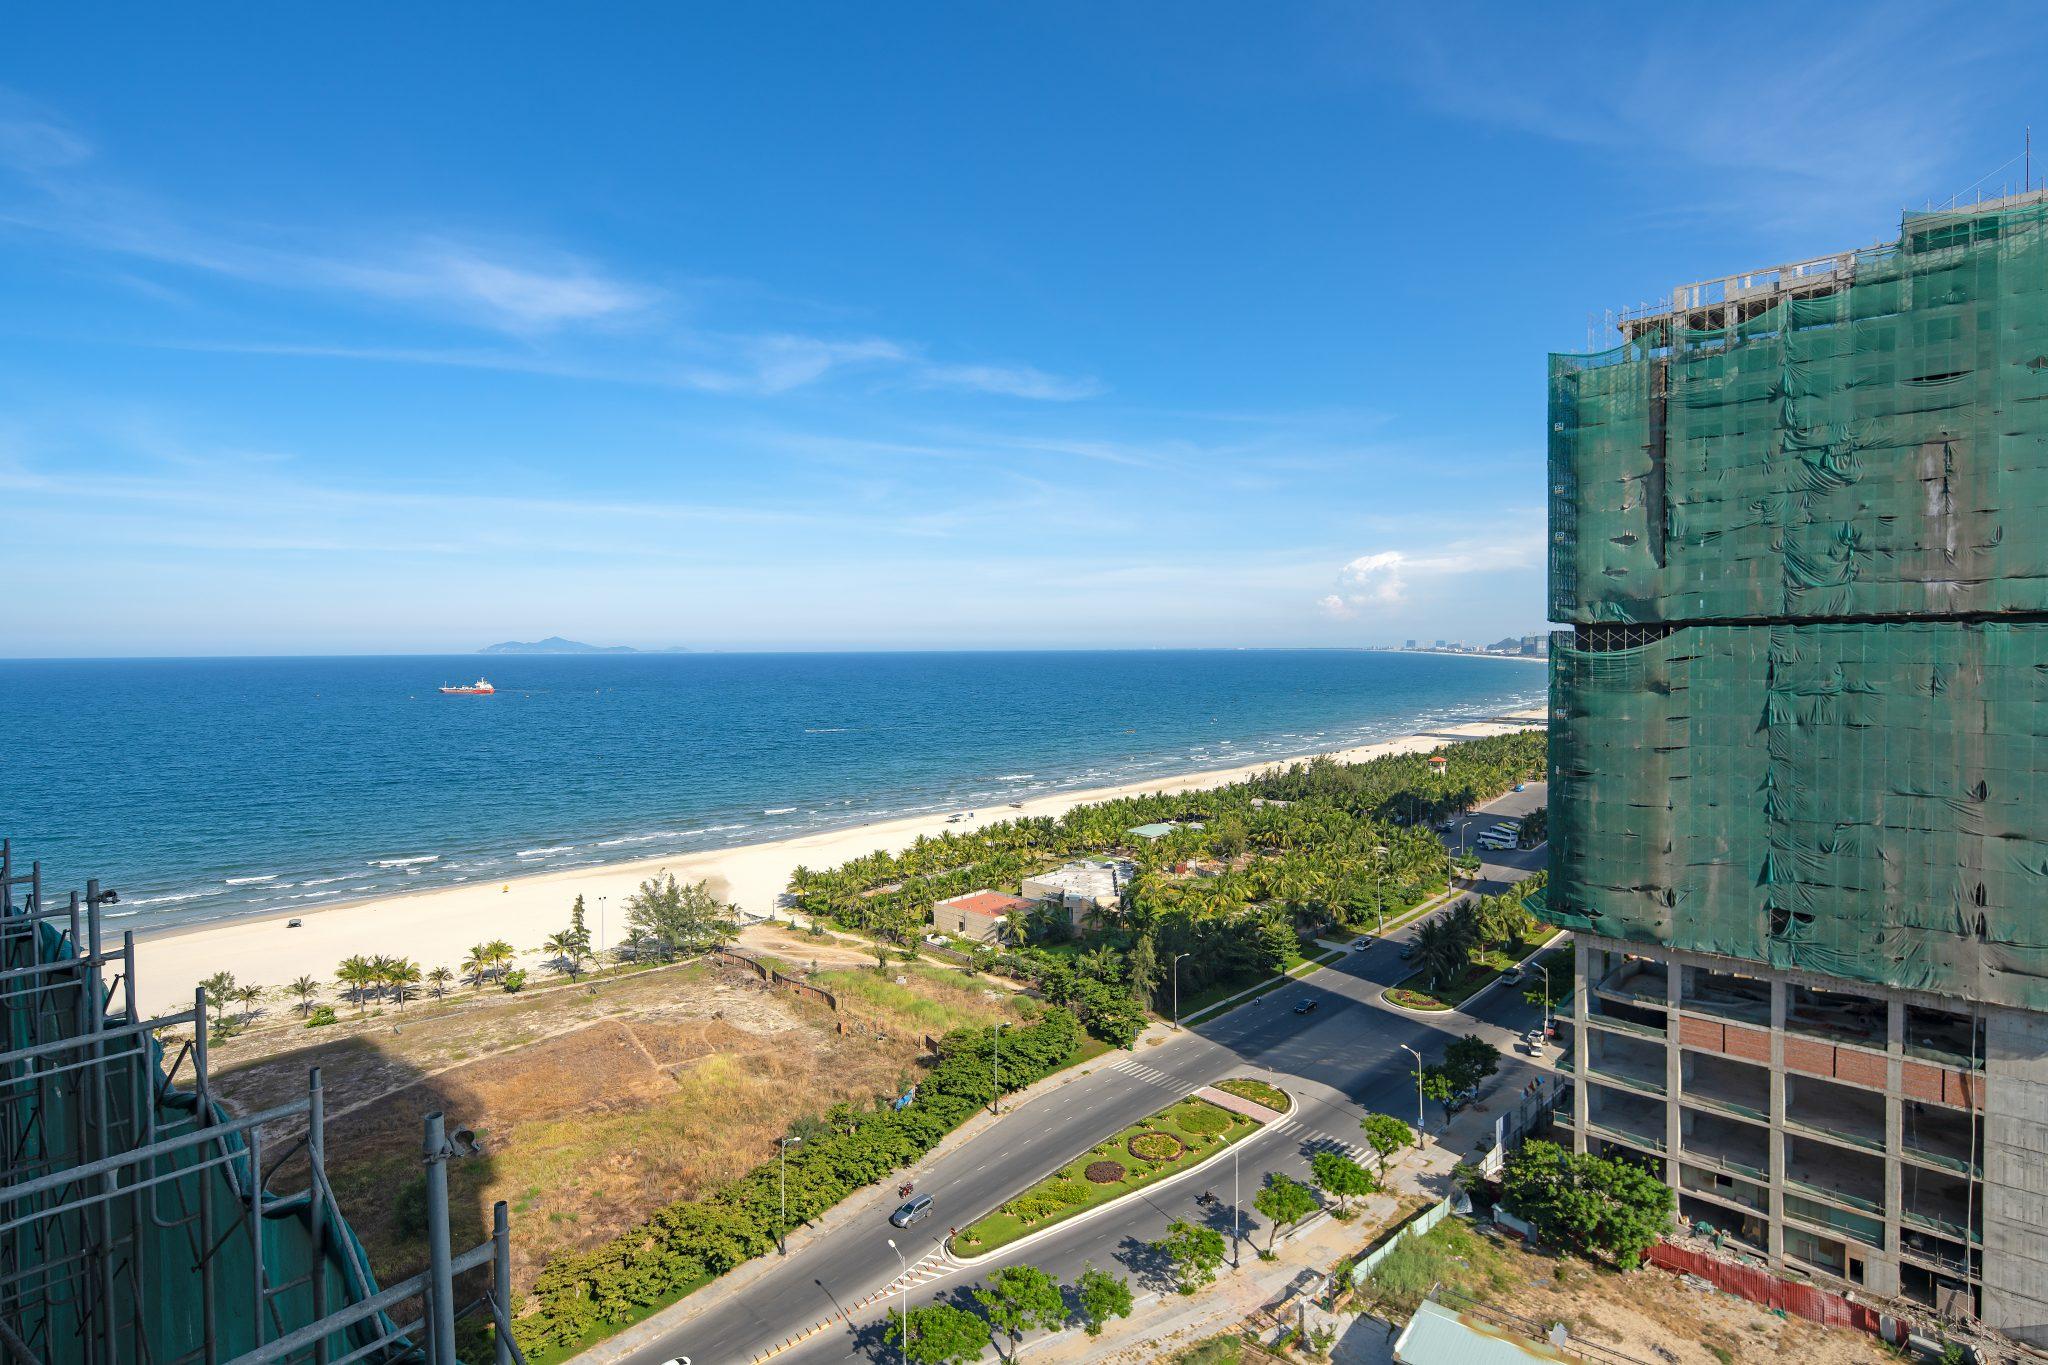 HAP9527 copy 6Nature - Danang Real Estate - Beachfront luxury condo for sale - Stunning location